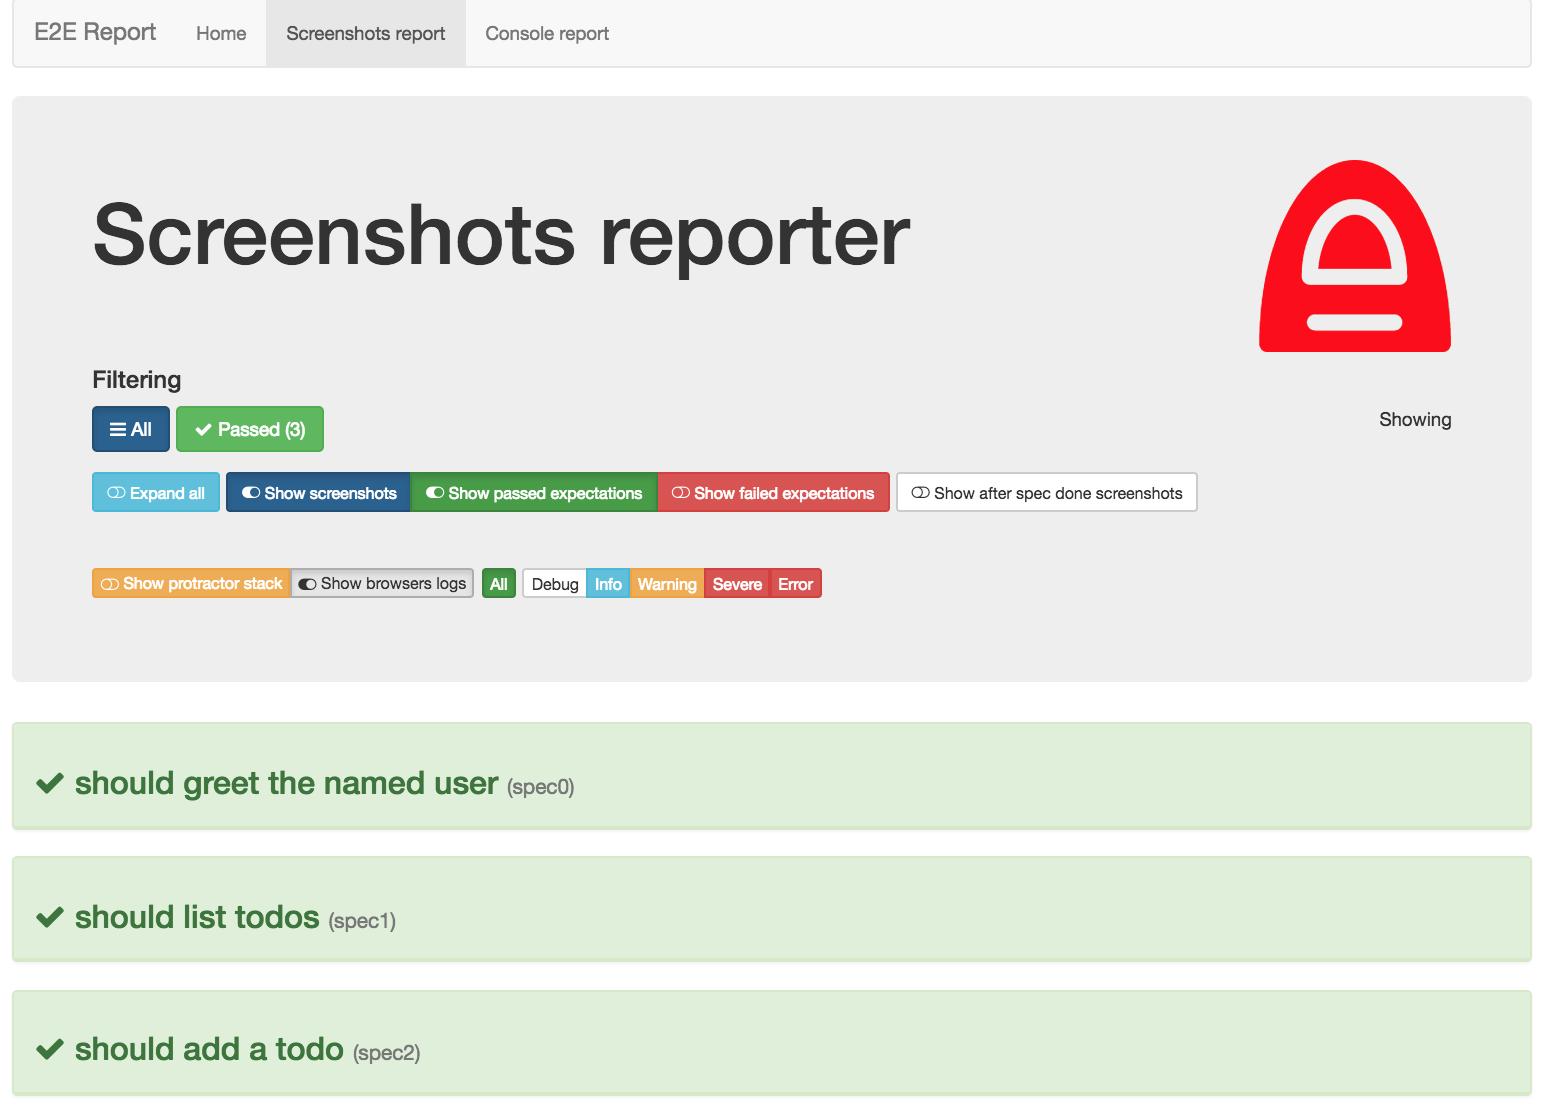 Screenshoter reporter controlls